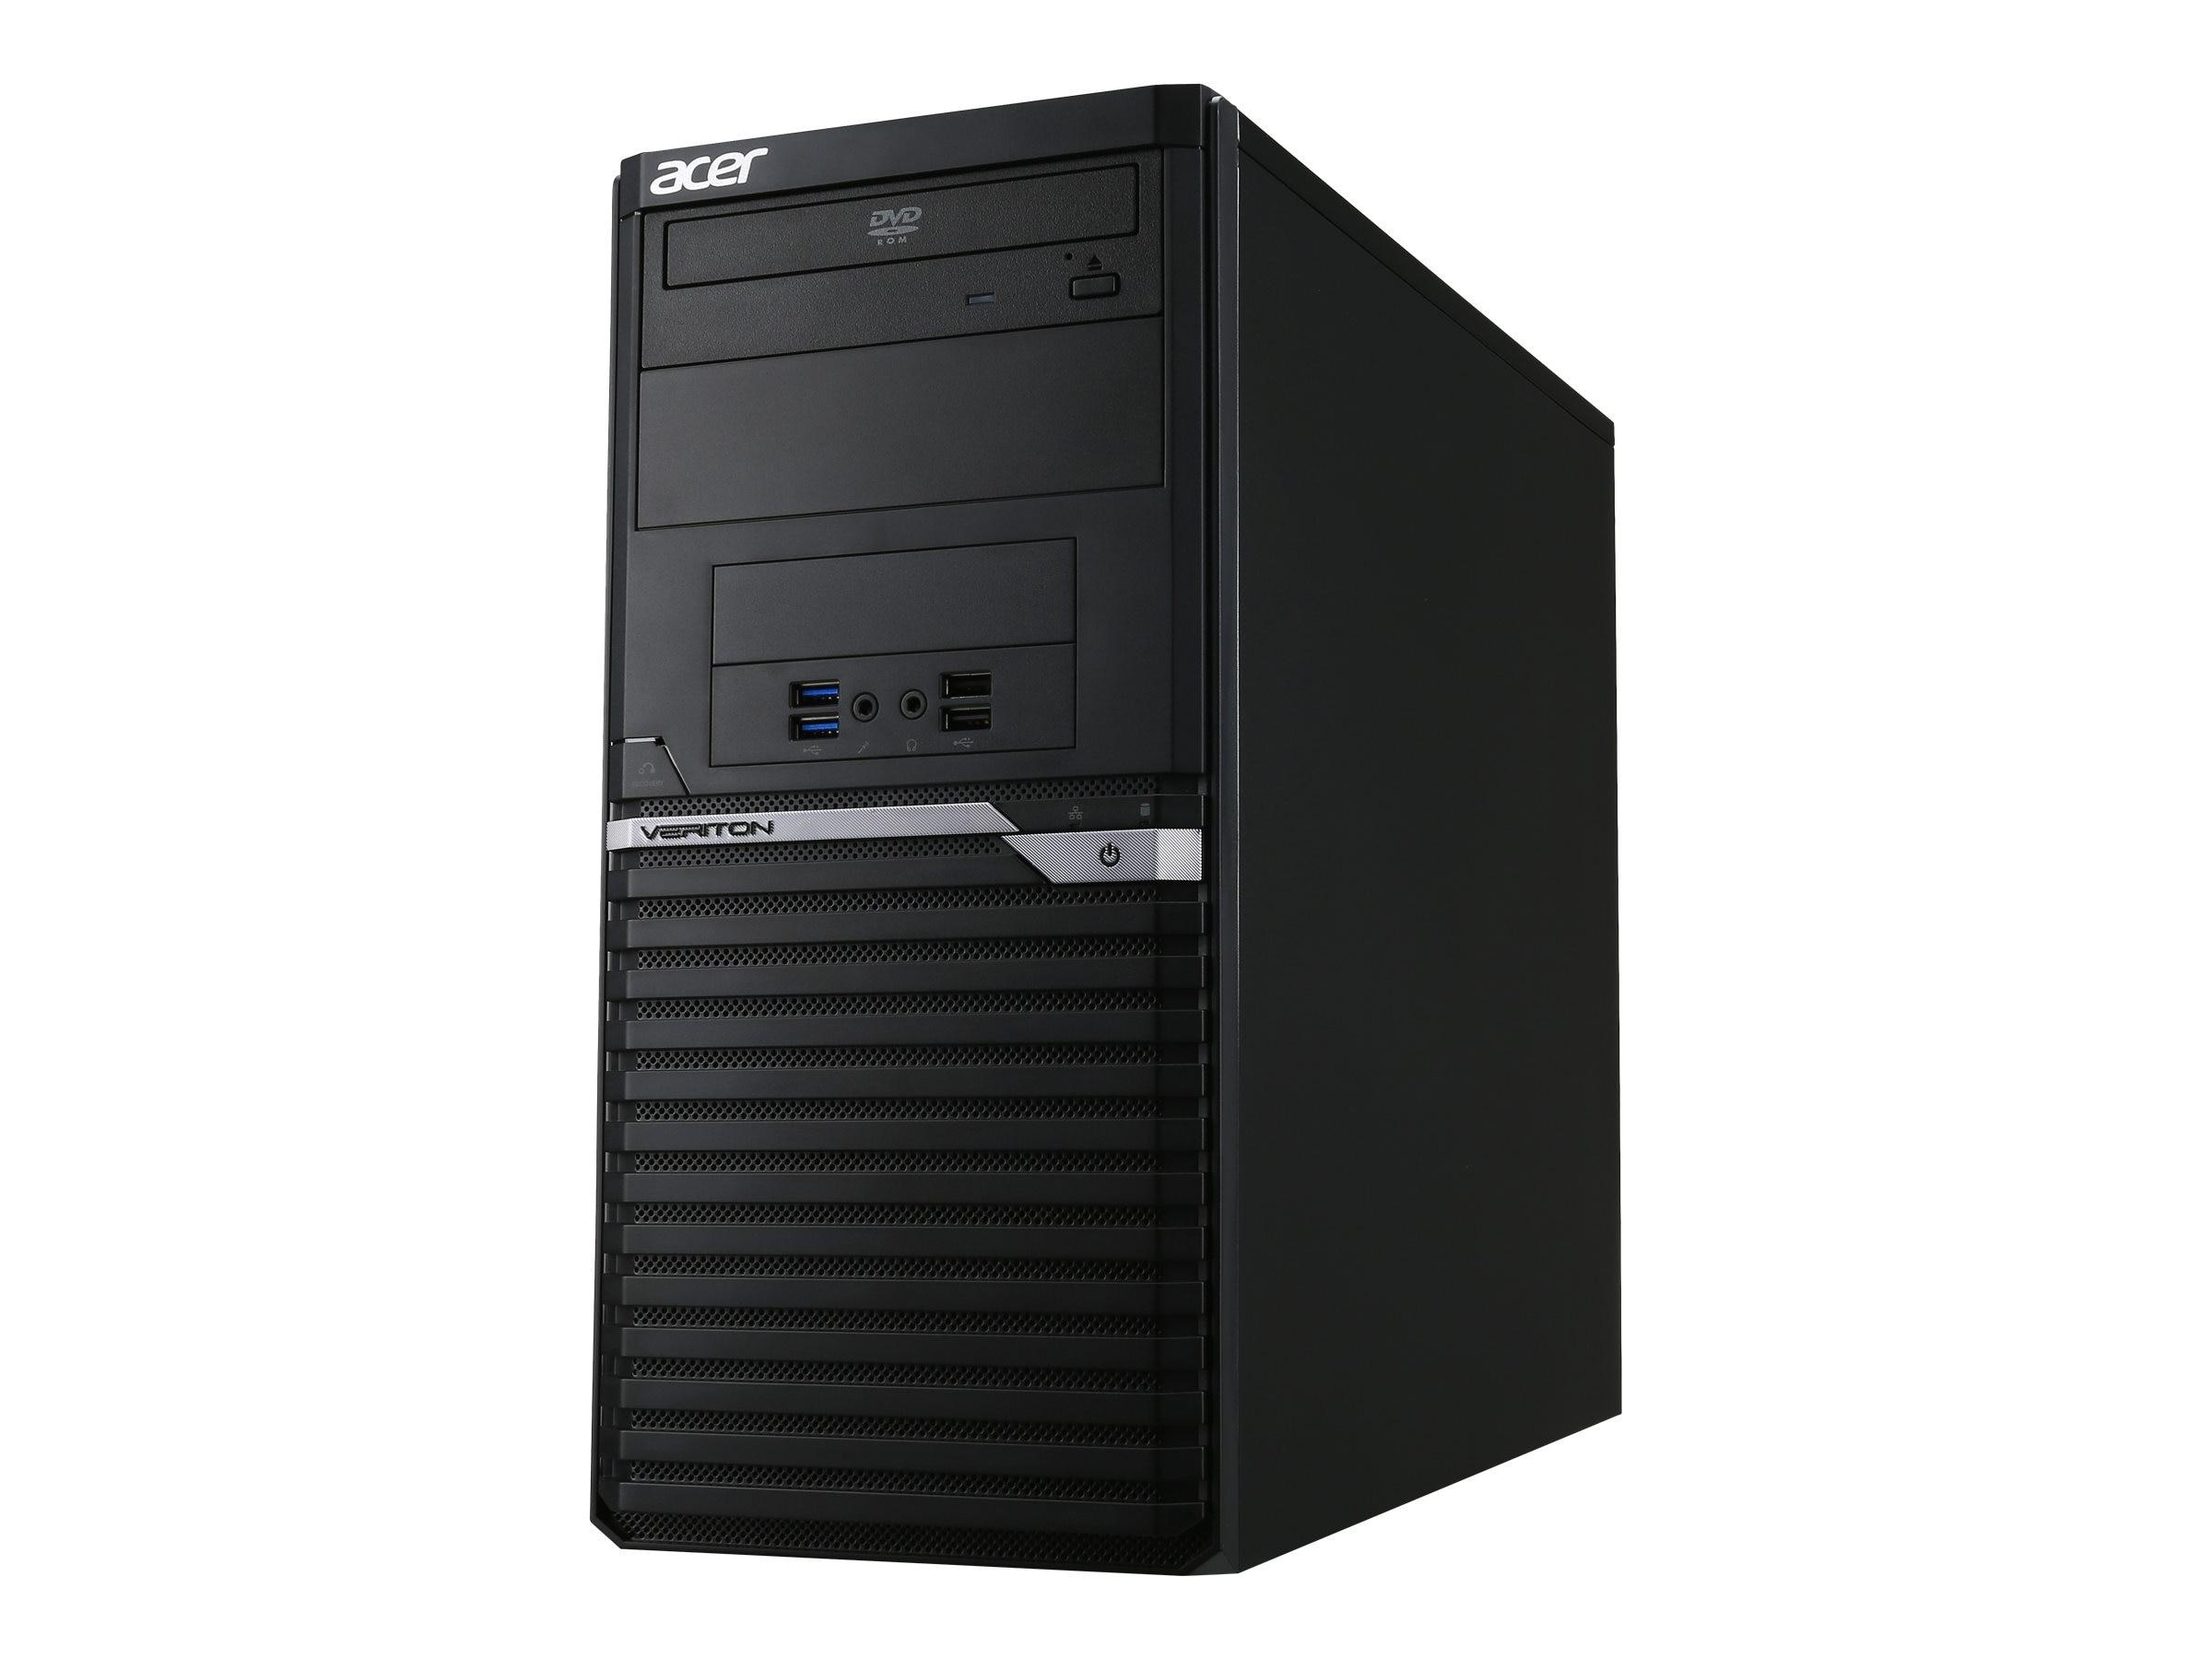 Acer Veriton M6640G-70020 3.2GHz Core i5 8GB RAM 240GB hard drive, UD.P01AA.328, 32465507, Desktops